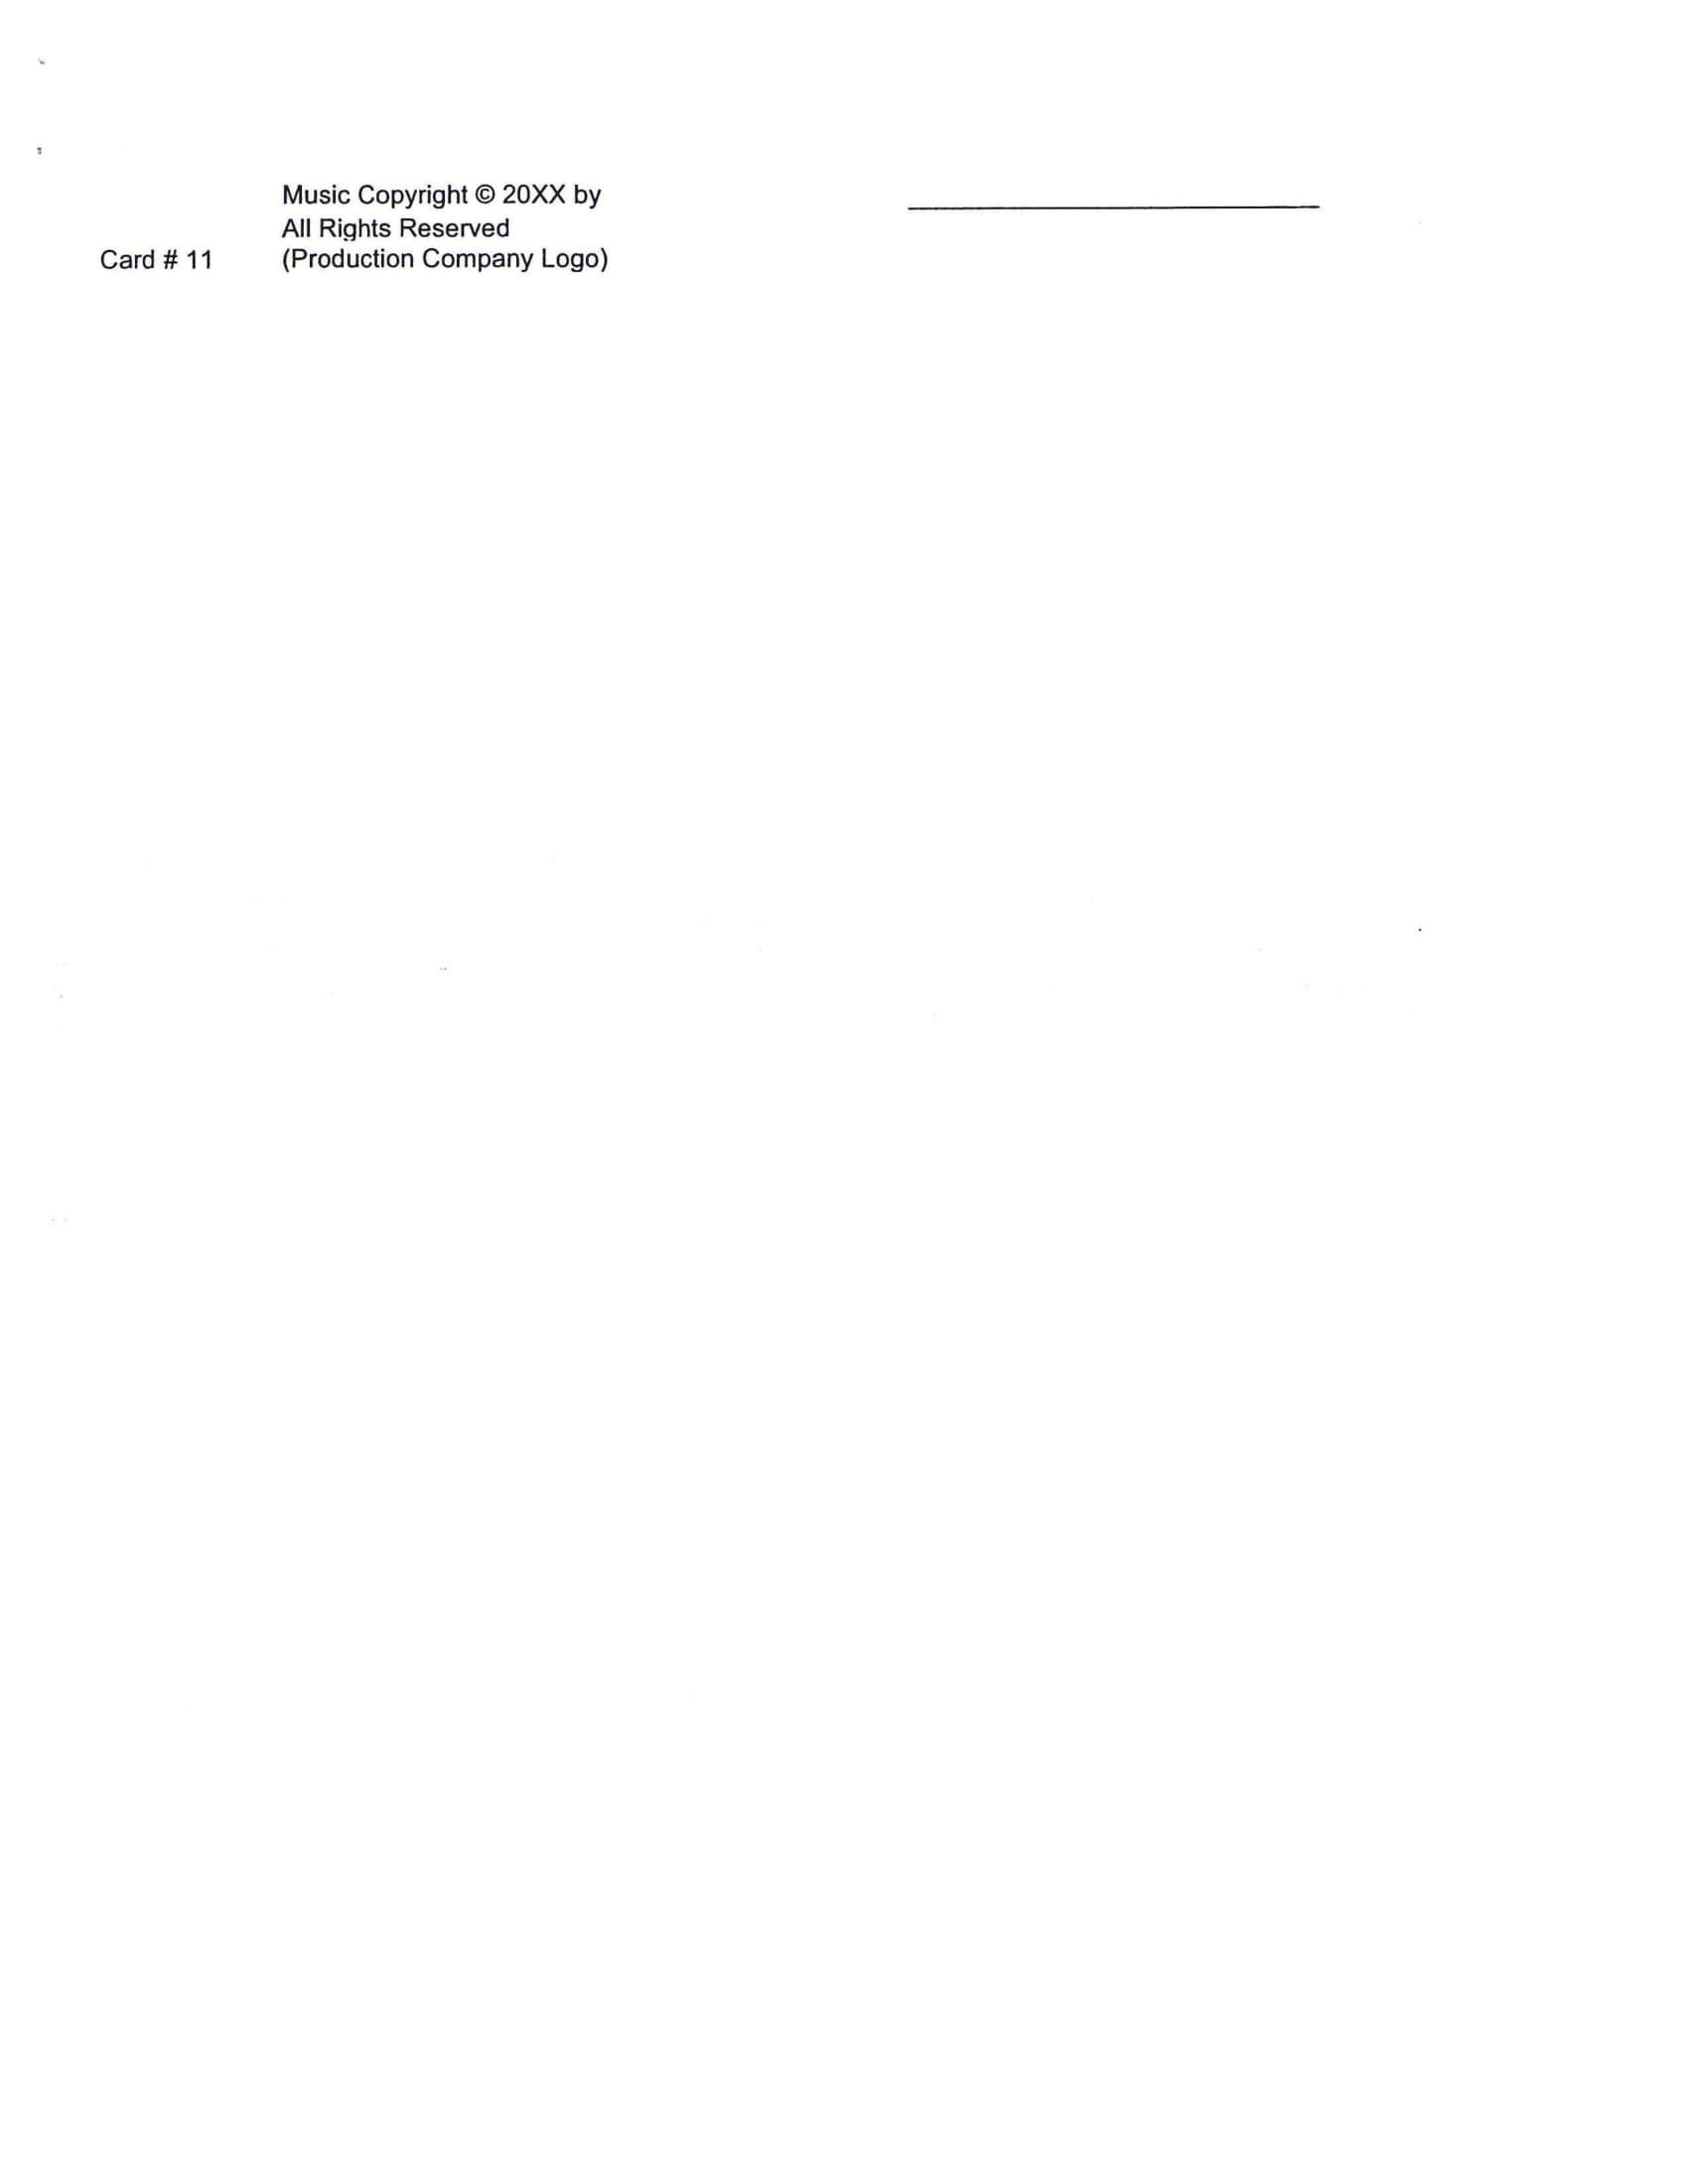 Production Worksheets-10.jpg